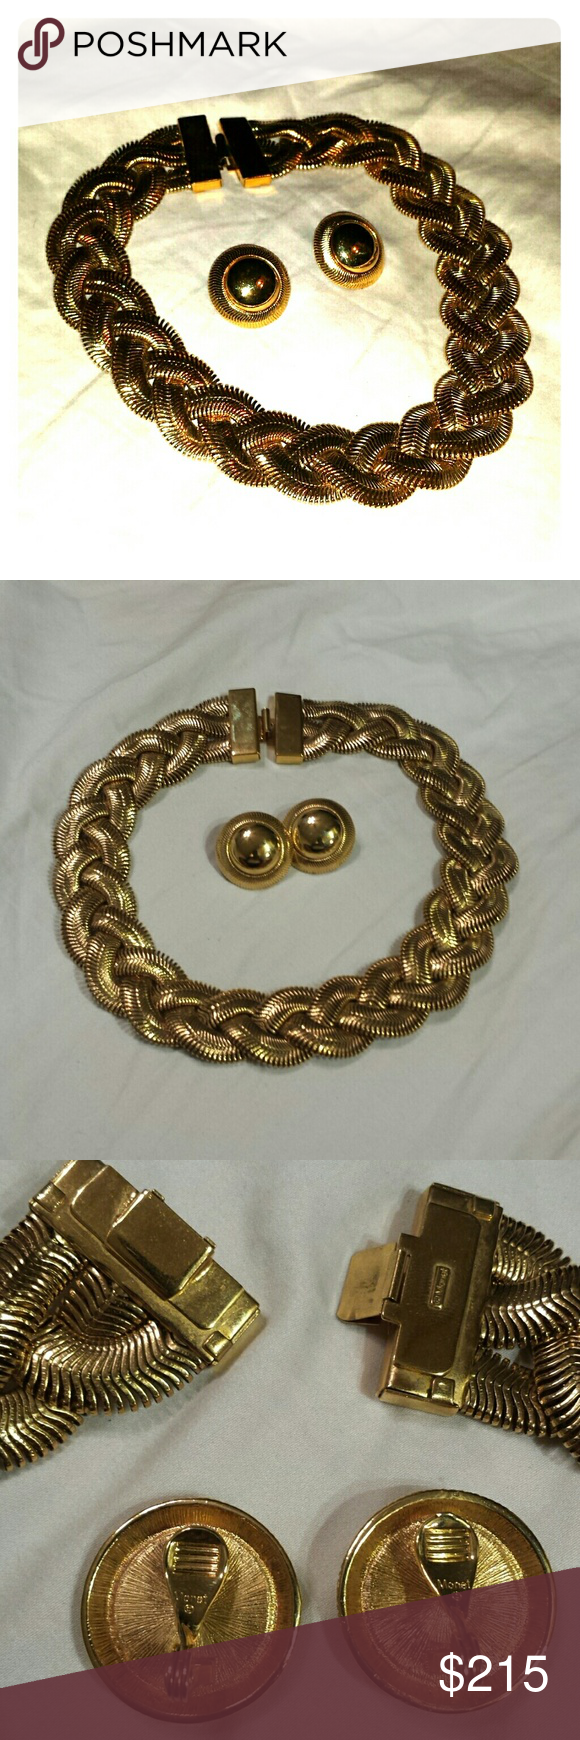 Nwot vintage monet 80s necklace earrings set Monet jewelry